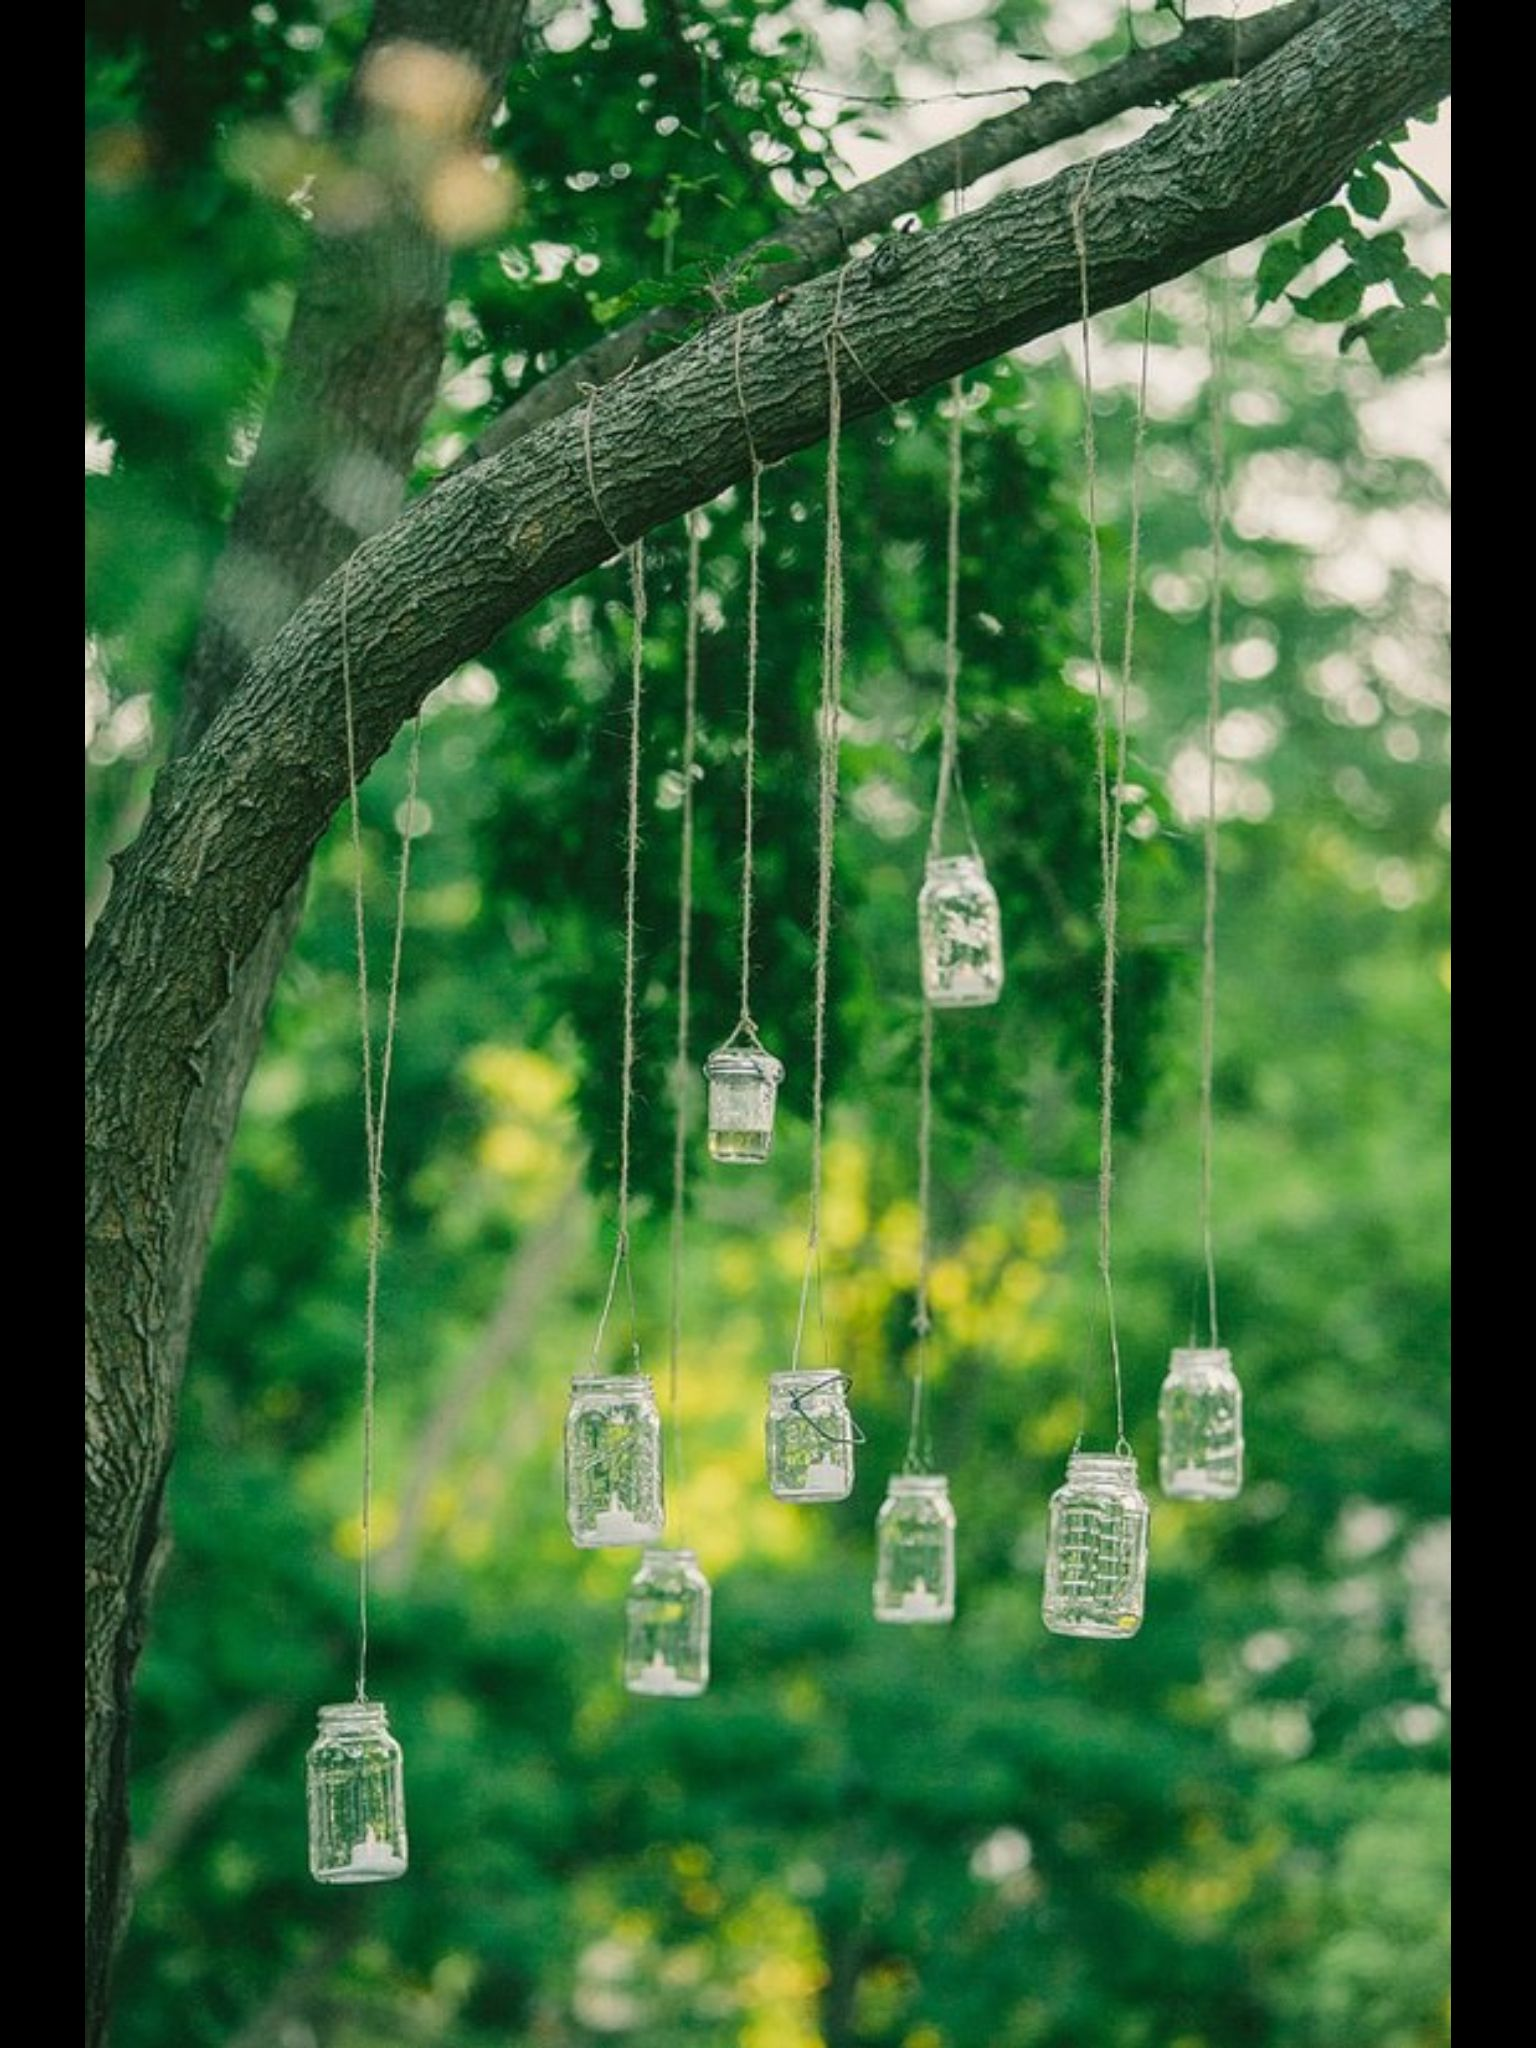 Wedding decorations hanging from trees  Velas colgantes  Velas  Pinterest  Weddings